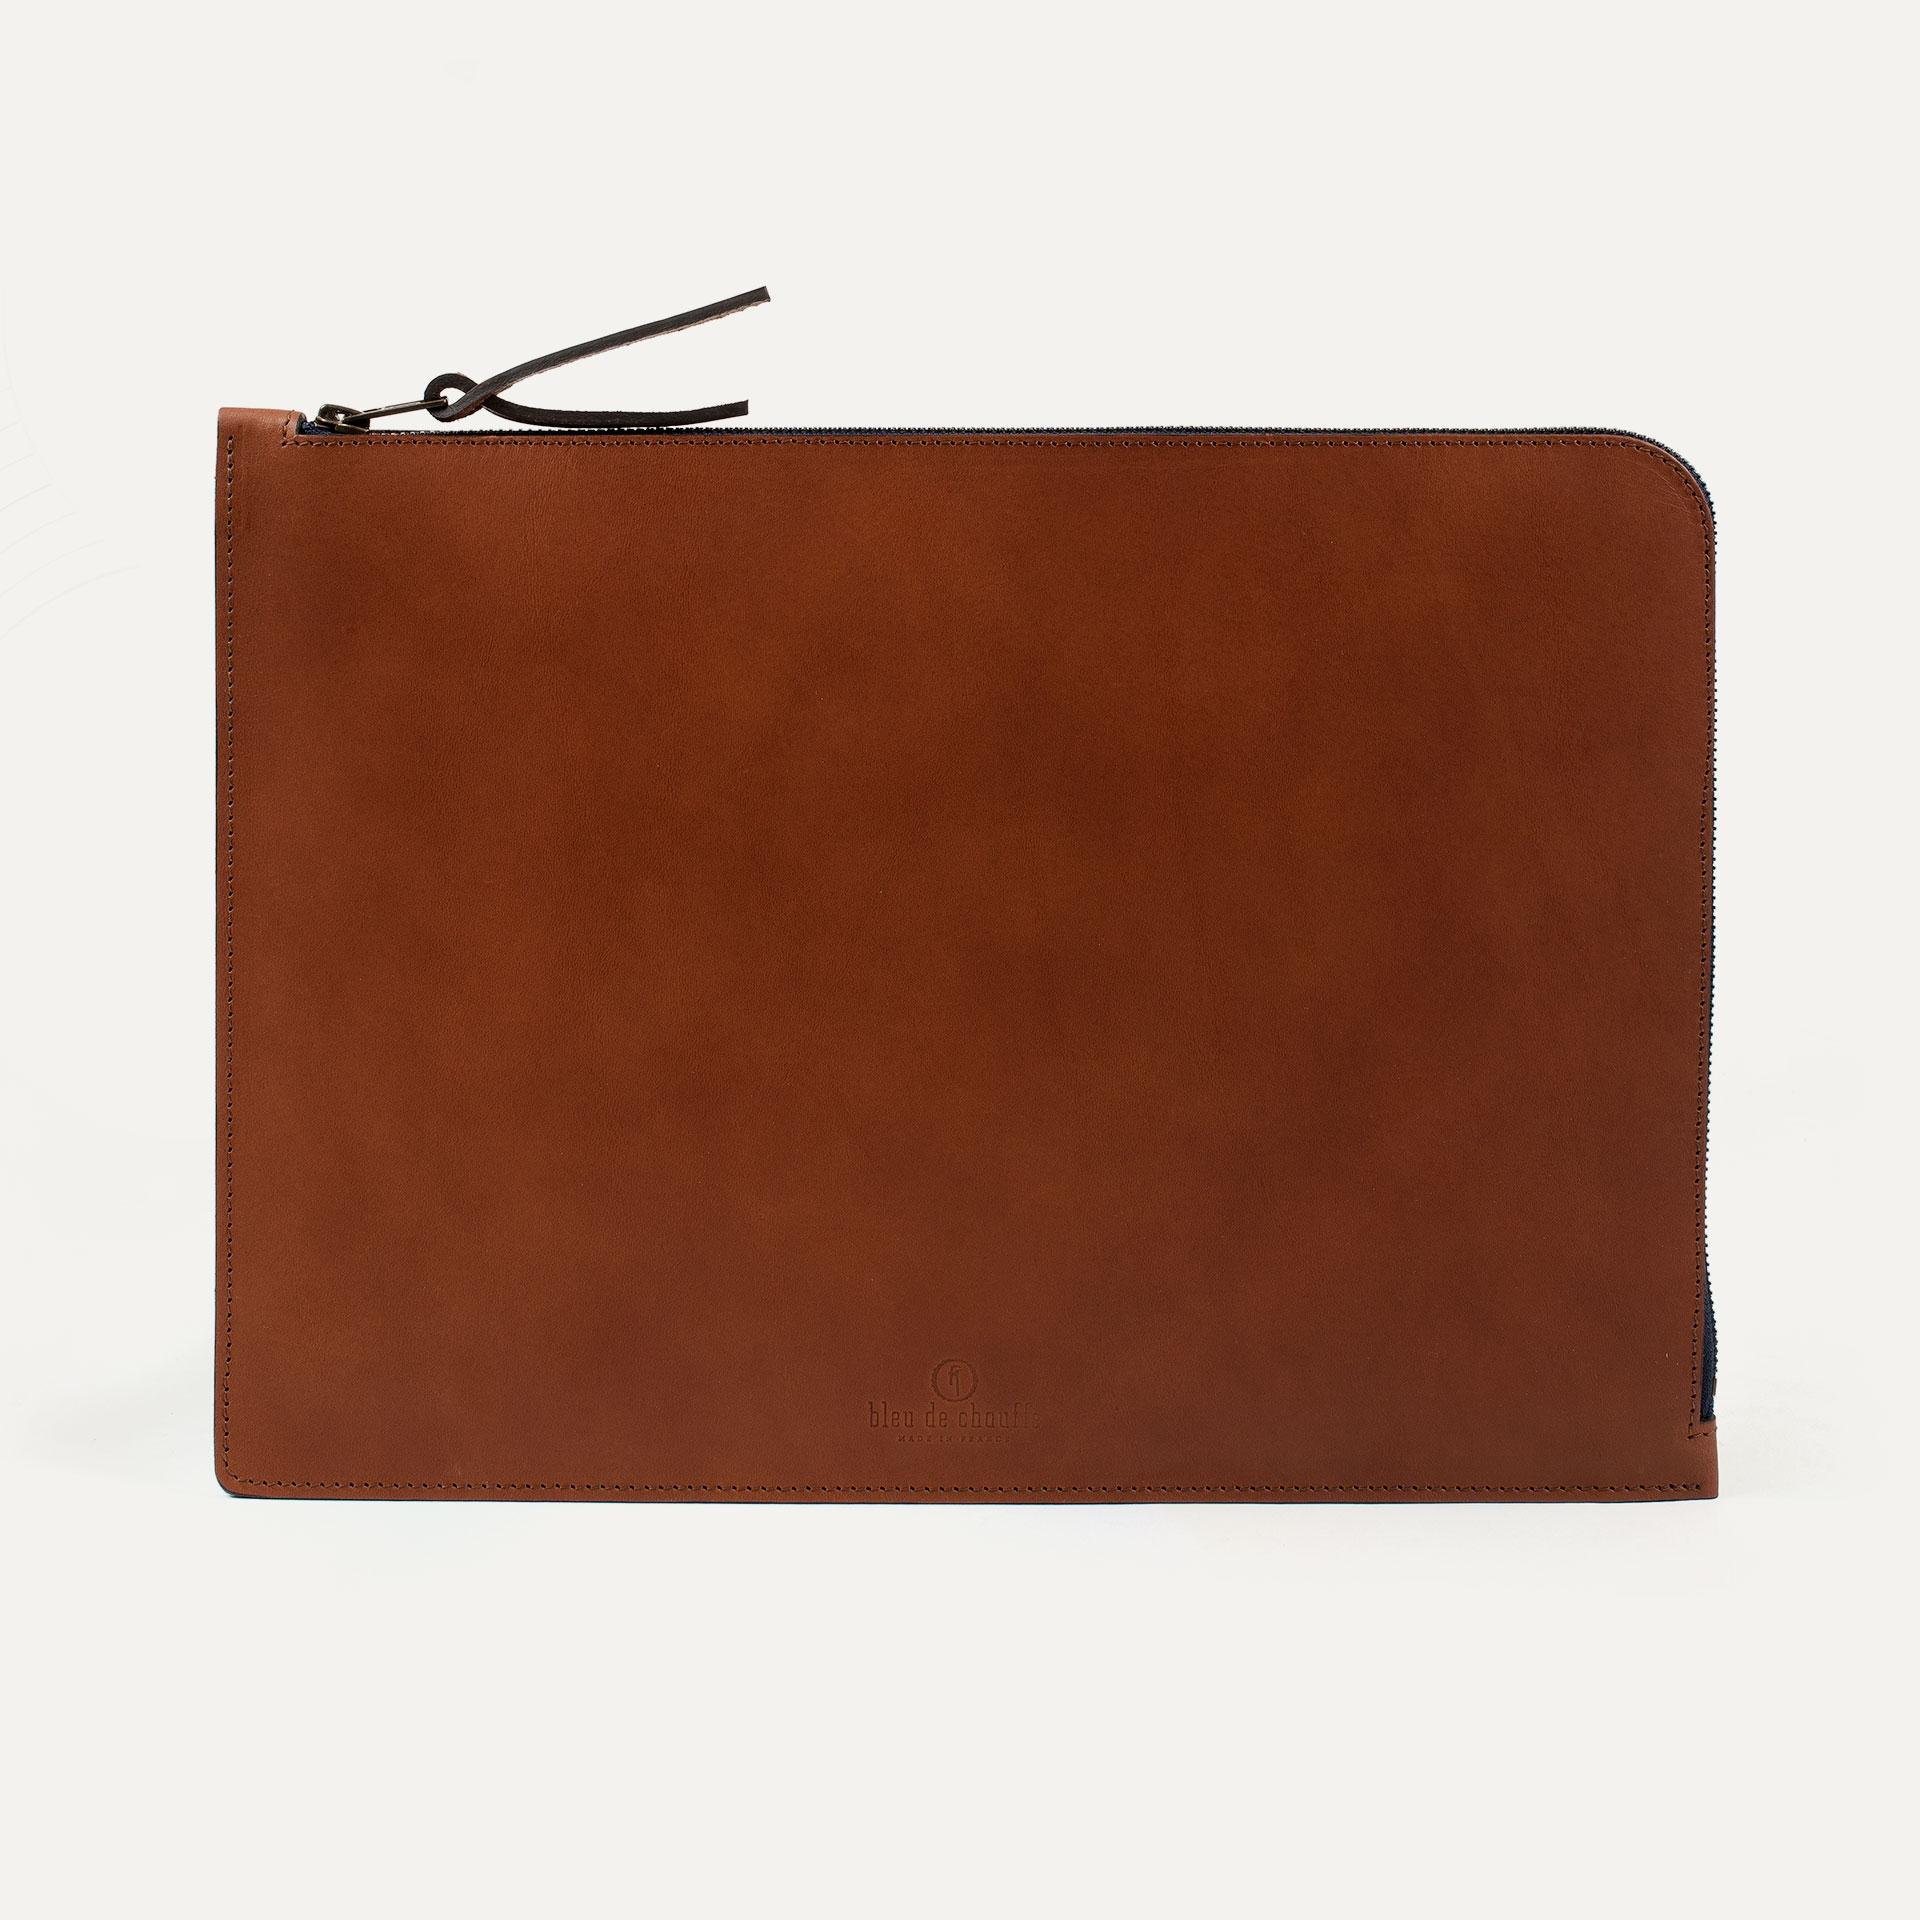 "Jim Laptop sleeve 13"" - Pain Brûlé (image n°2)"